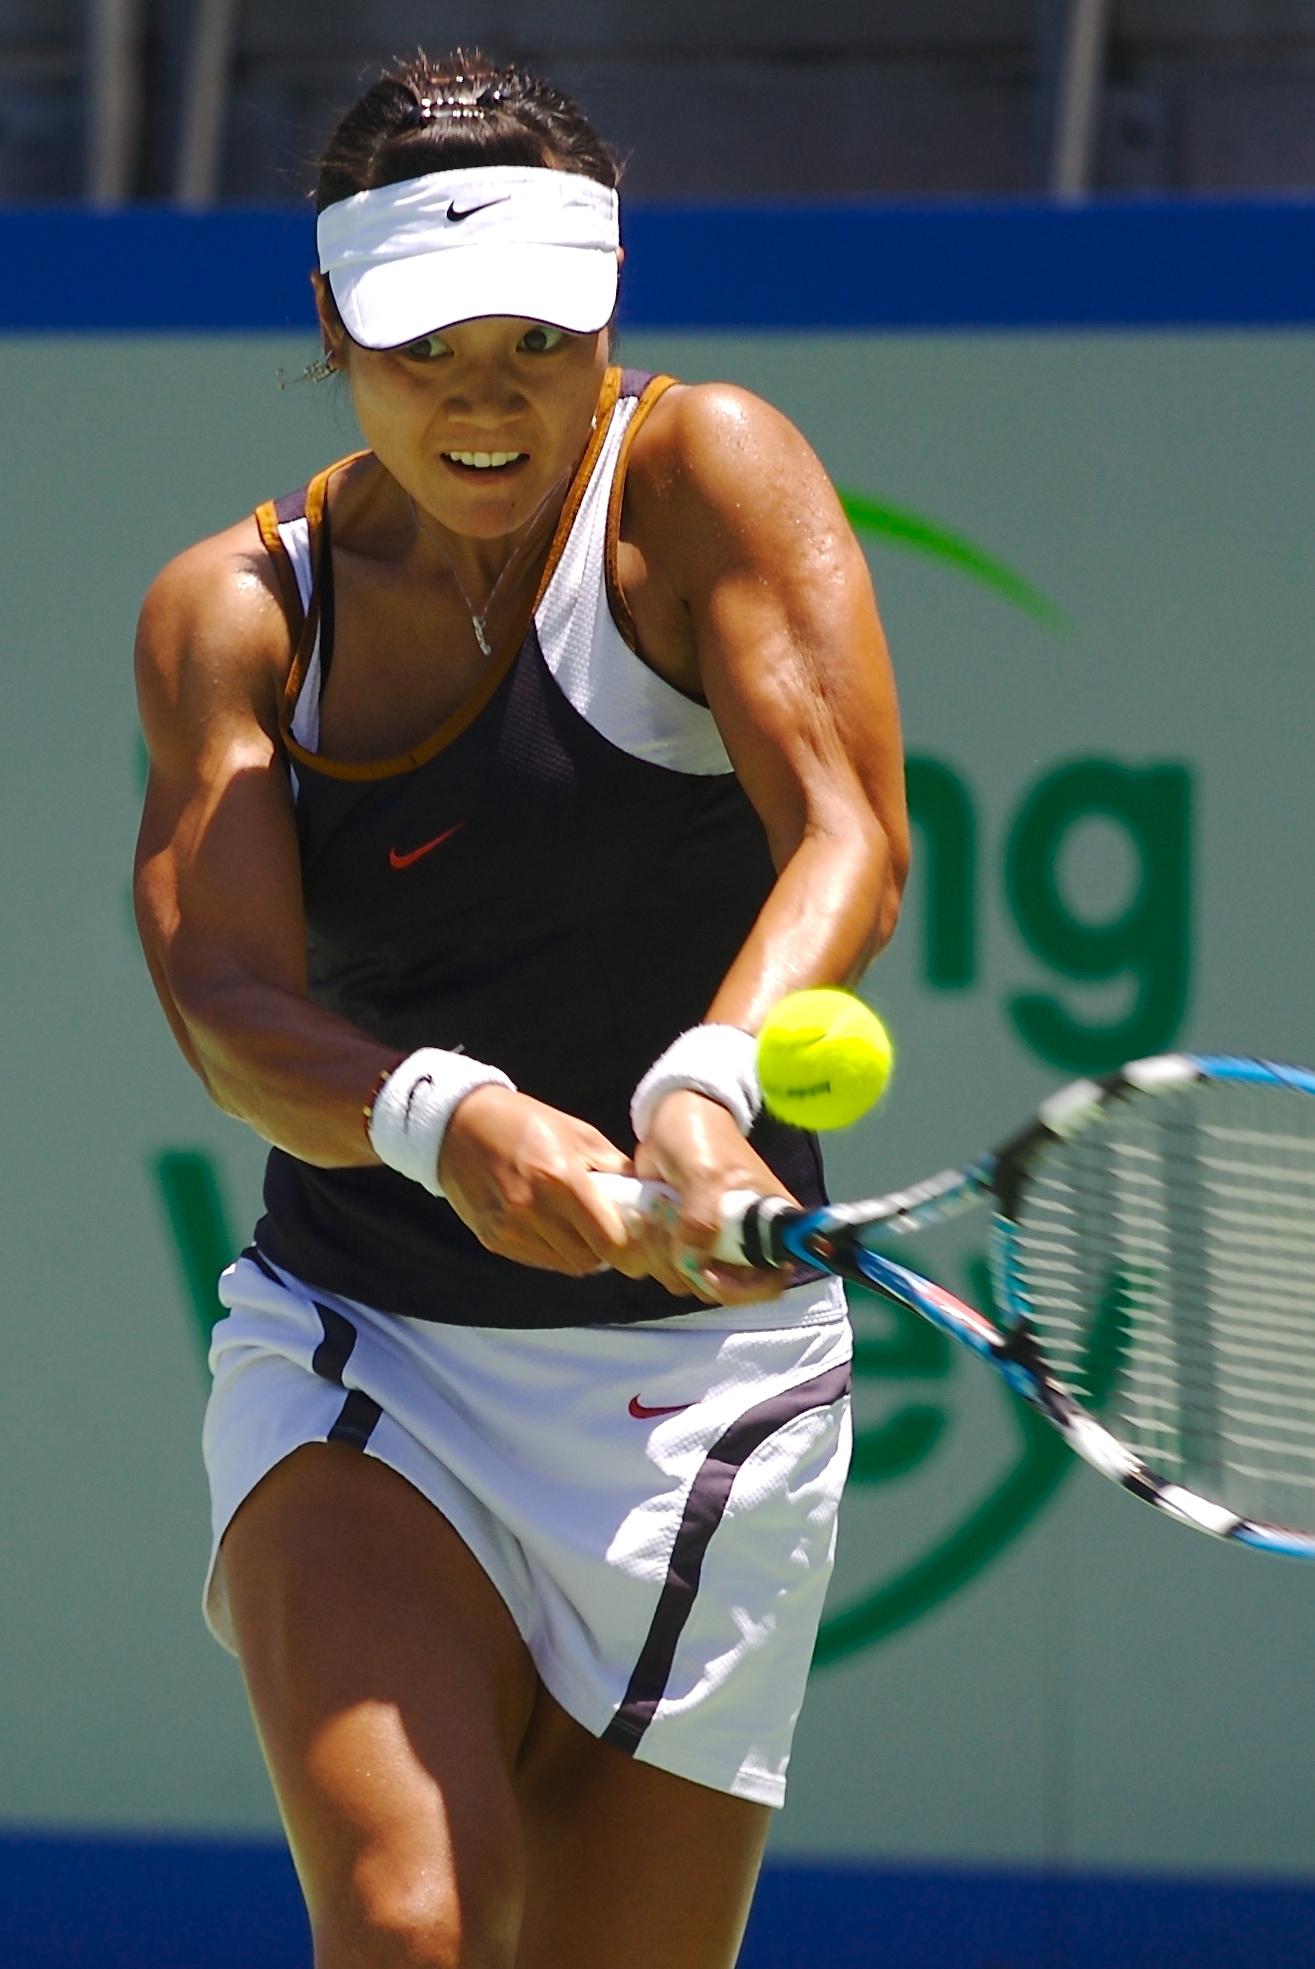 Li Na, Çinli profesyonel tenisçi tarihte bugün